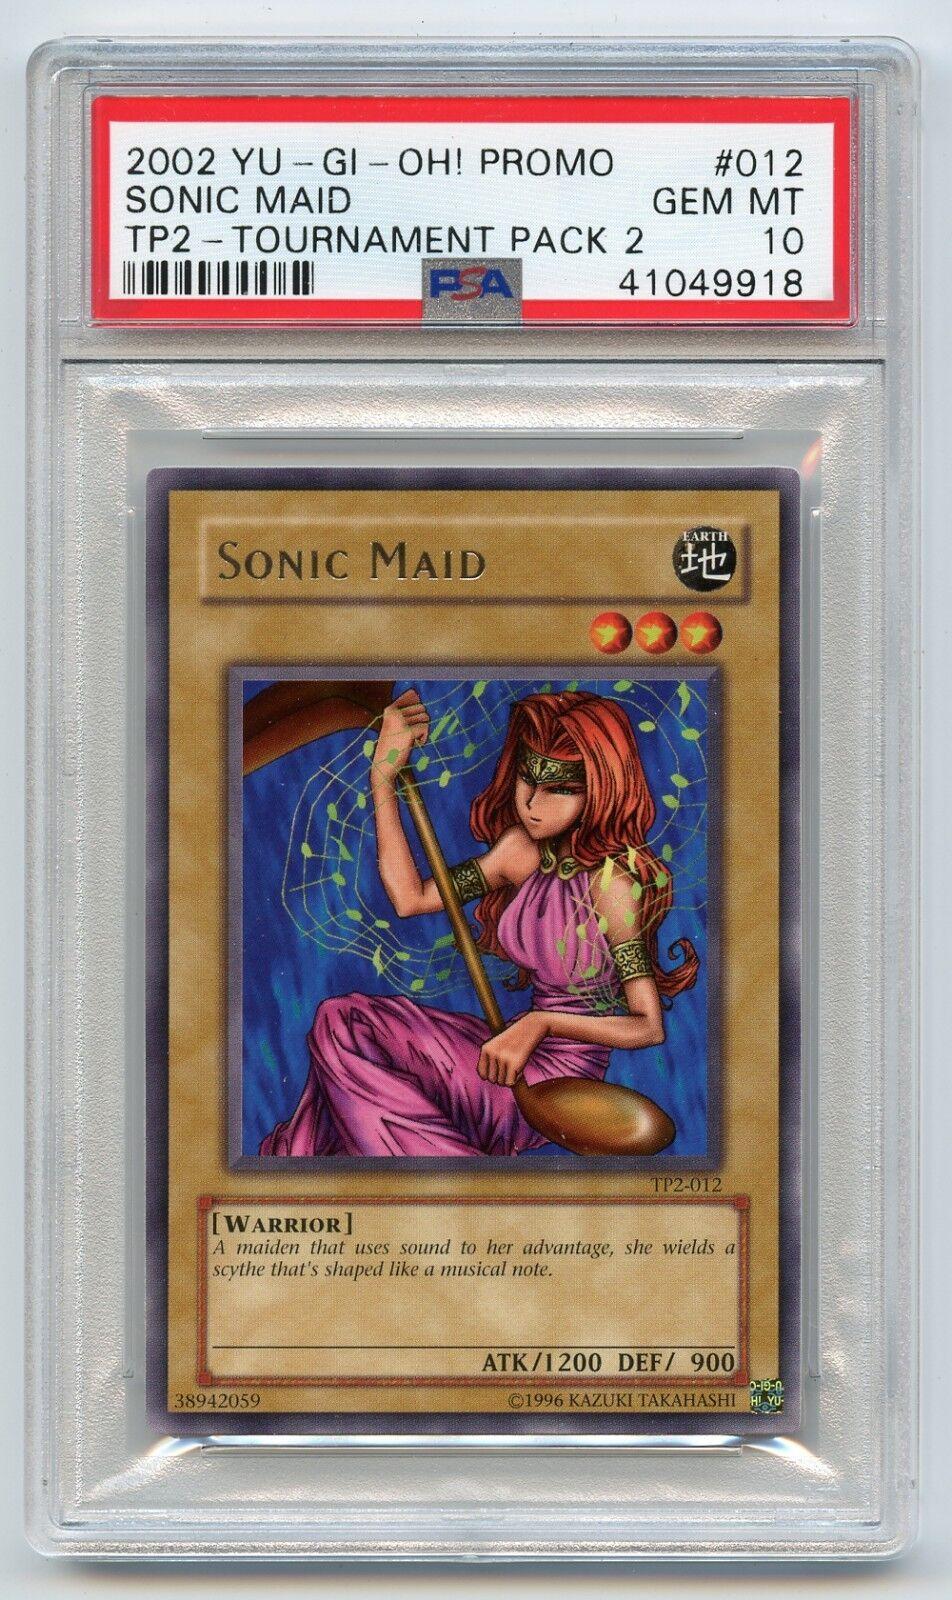 2002 Yu-Gi-Oh torneo torneo torneo Pack 2 Sonic Maid TP2-012 Profesional autenticador de deportes 10 Gema Menta Raro 5bcfe9